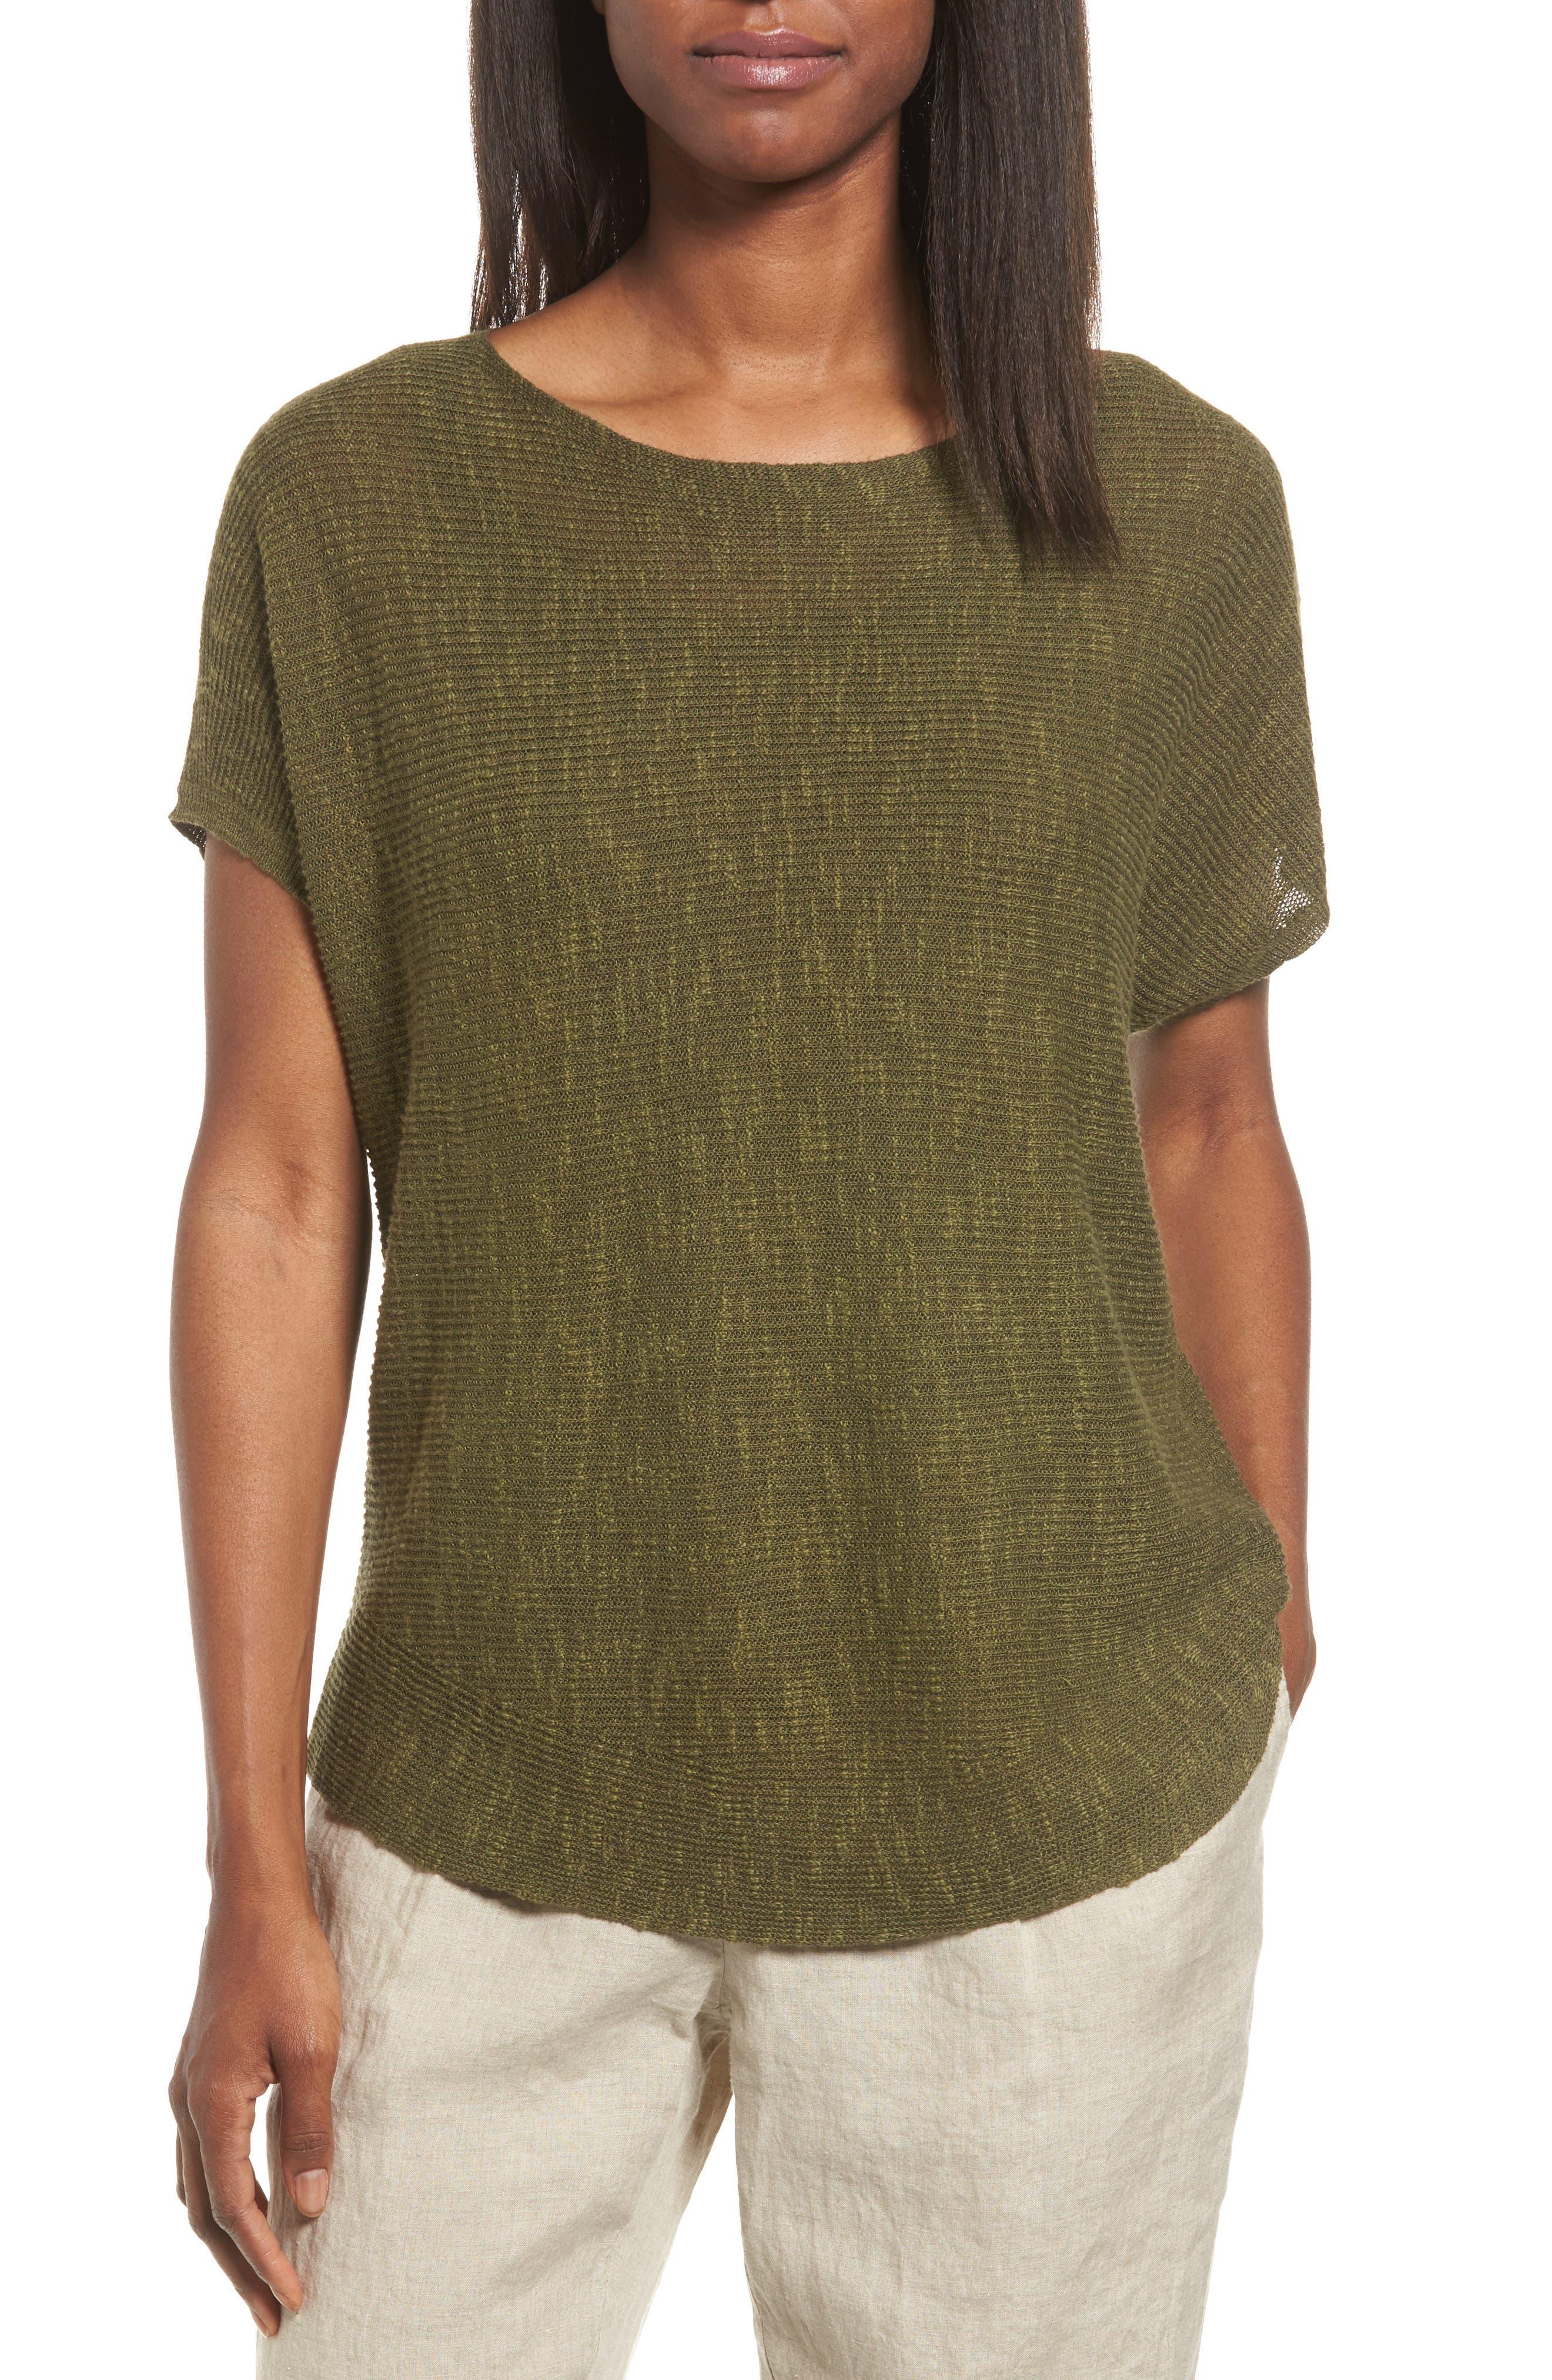 Main Image - Eileen Fisher Organic Linen & Cotton Knit Top (Regular & Petite)